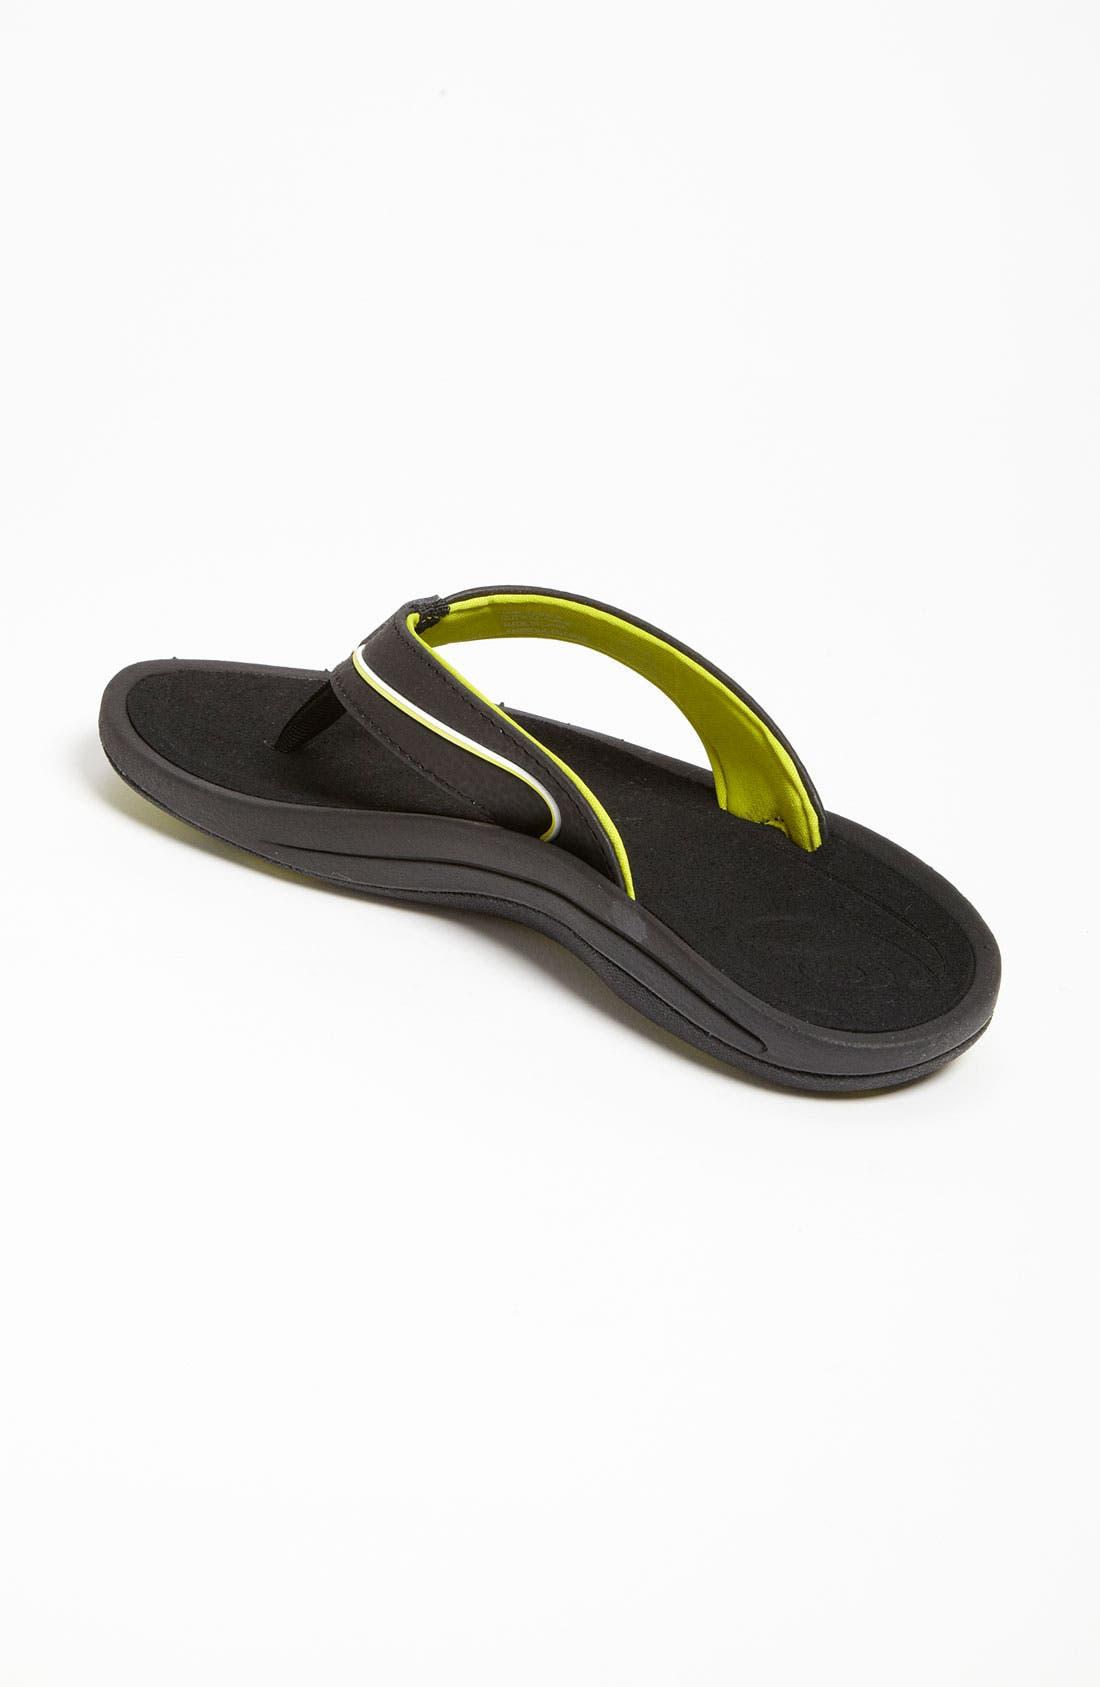 Alternate Image 2  - OluKai 'Lele' Flip Flop